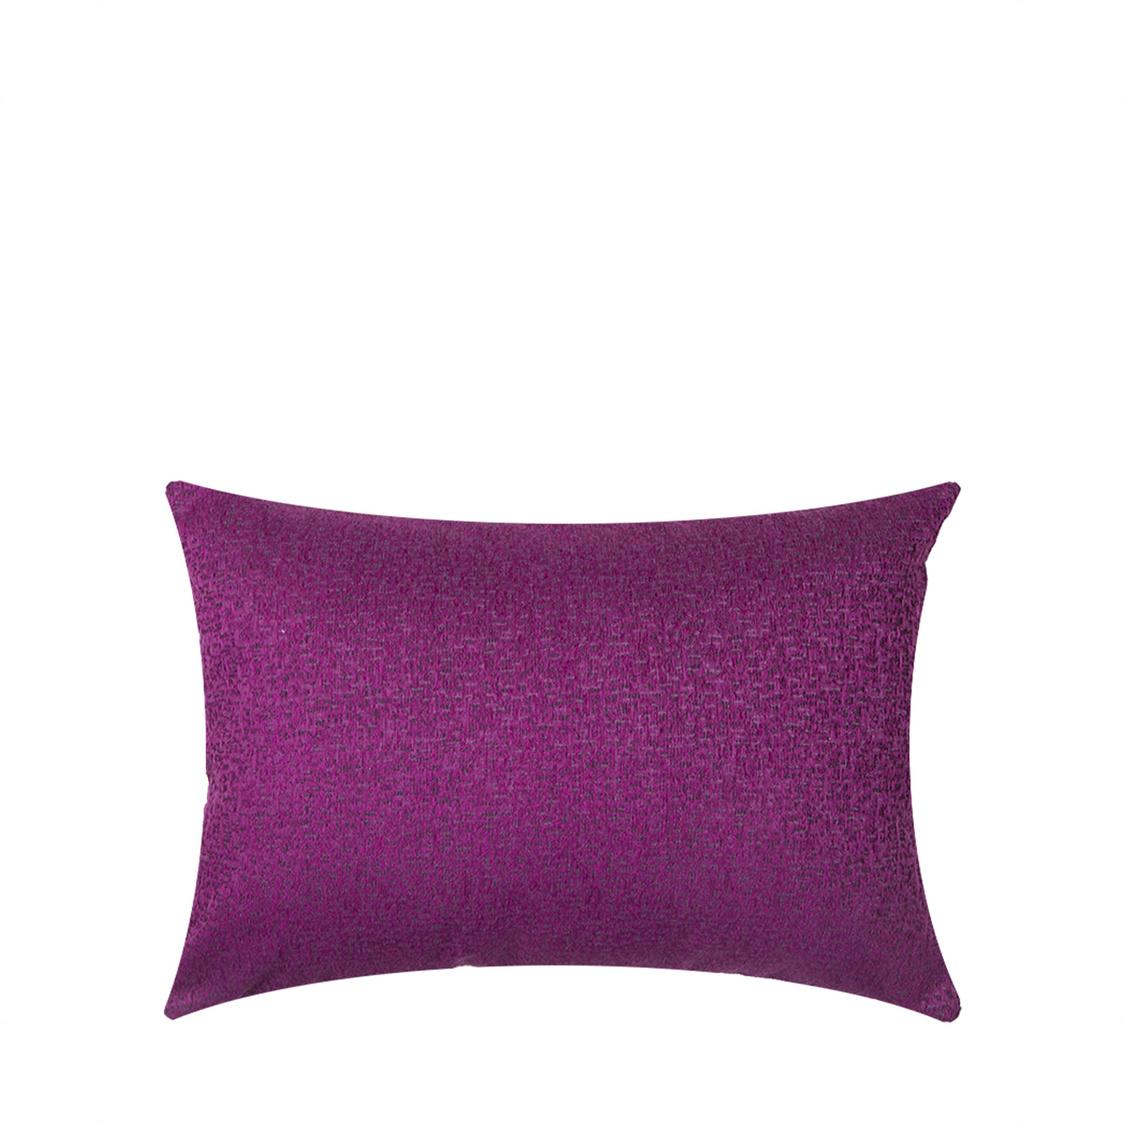 JRapee Lindie Oblong Cushion Purple 33x48cm